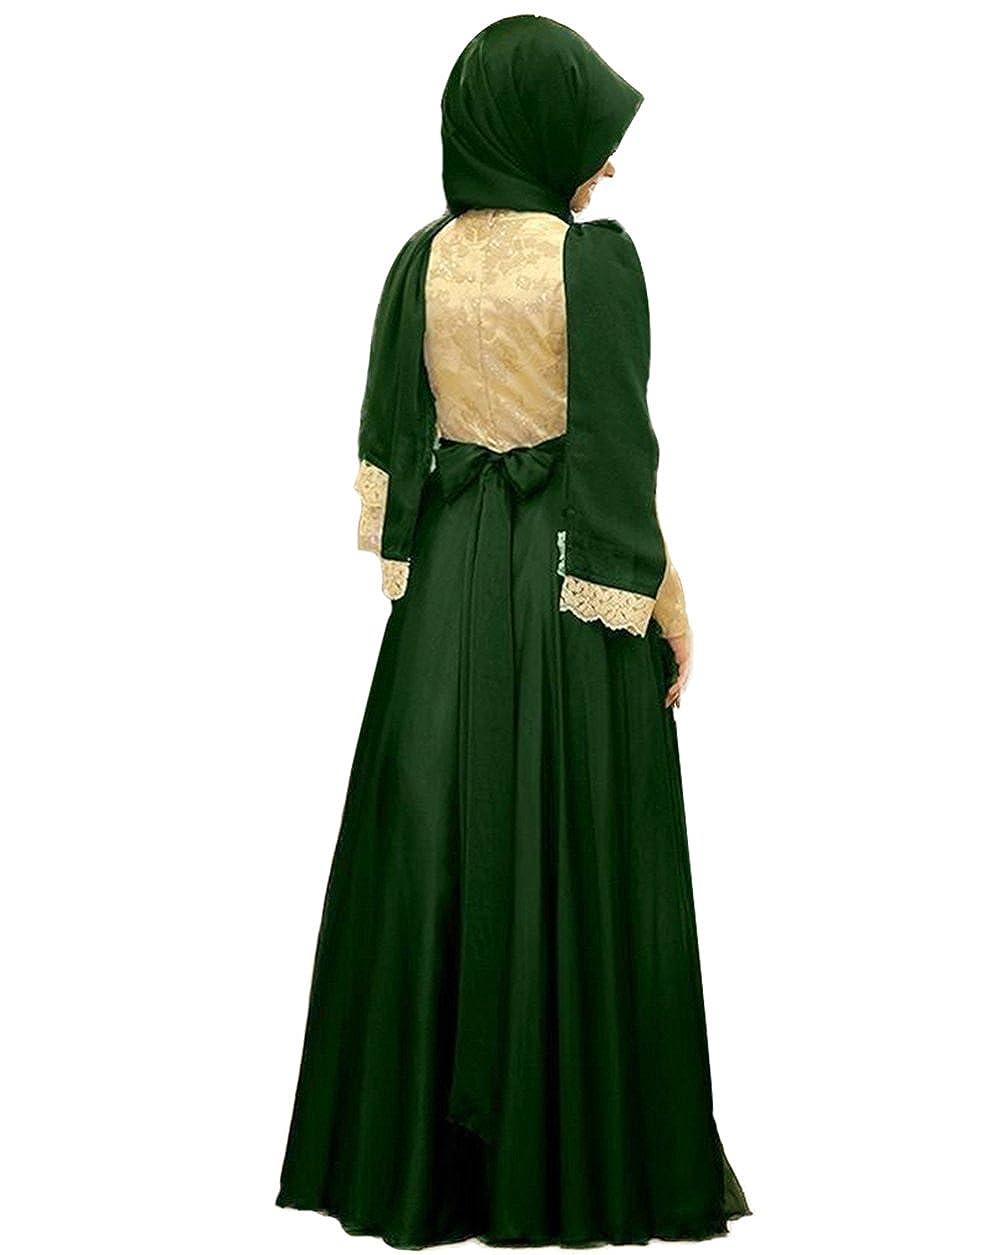 Amazon.com: Oyeahbridal Purple Formal Muslim Women Dress Hijab Kaftan Bow Evening Prom Gowns: Clothing